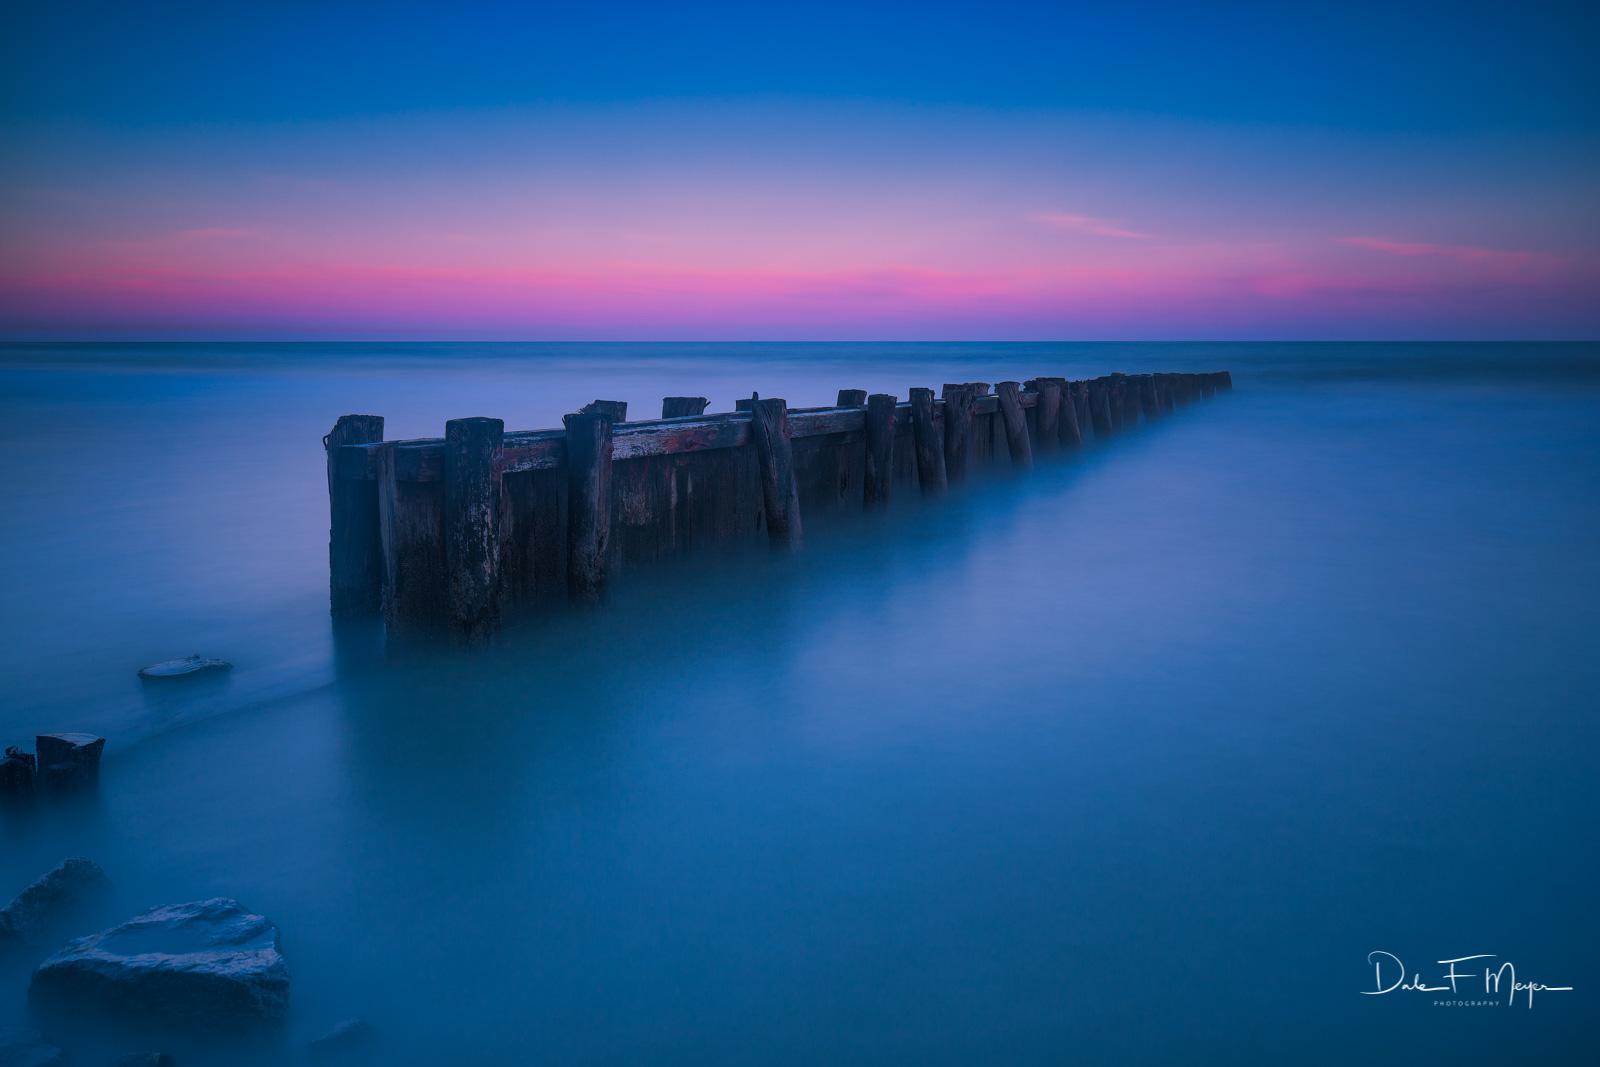 Costal,Pier,long exposure,sunset, photo